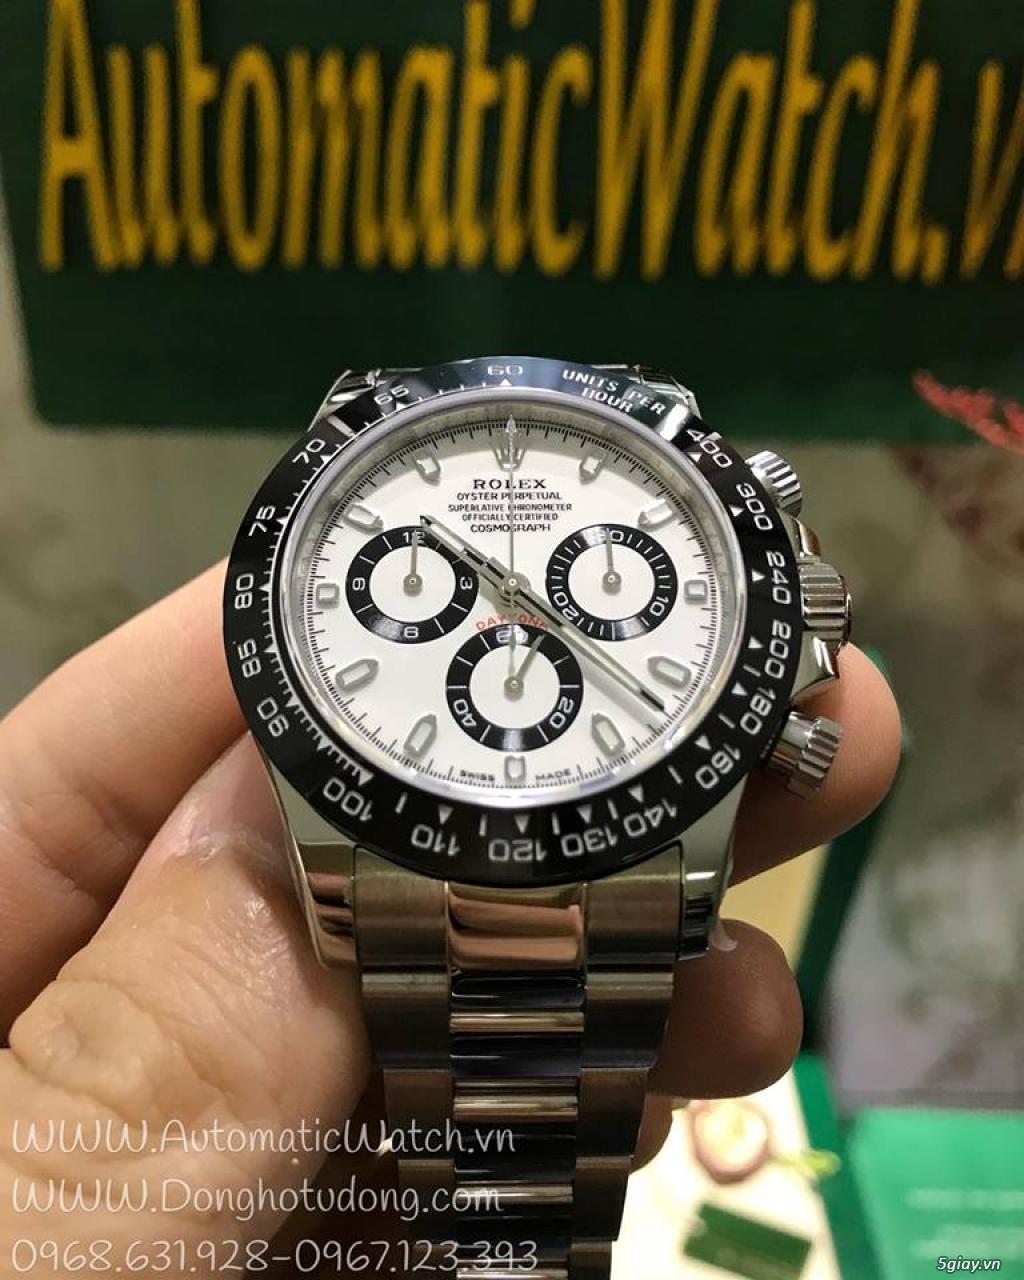 Chuyên đồng hồ Rolex,Hublot,AP, Patek Philippe...Replica1:1 Swiss Made - 3